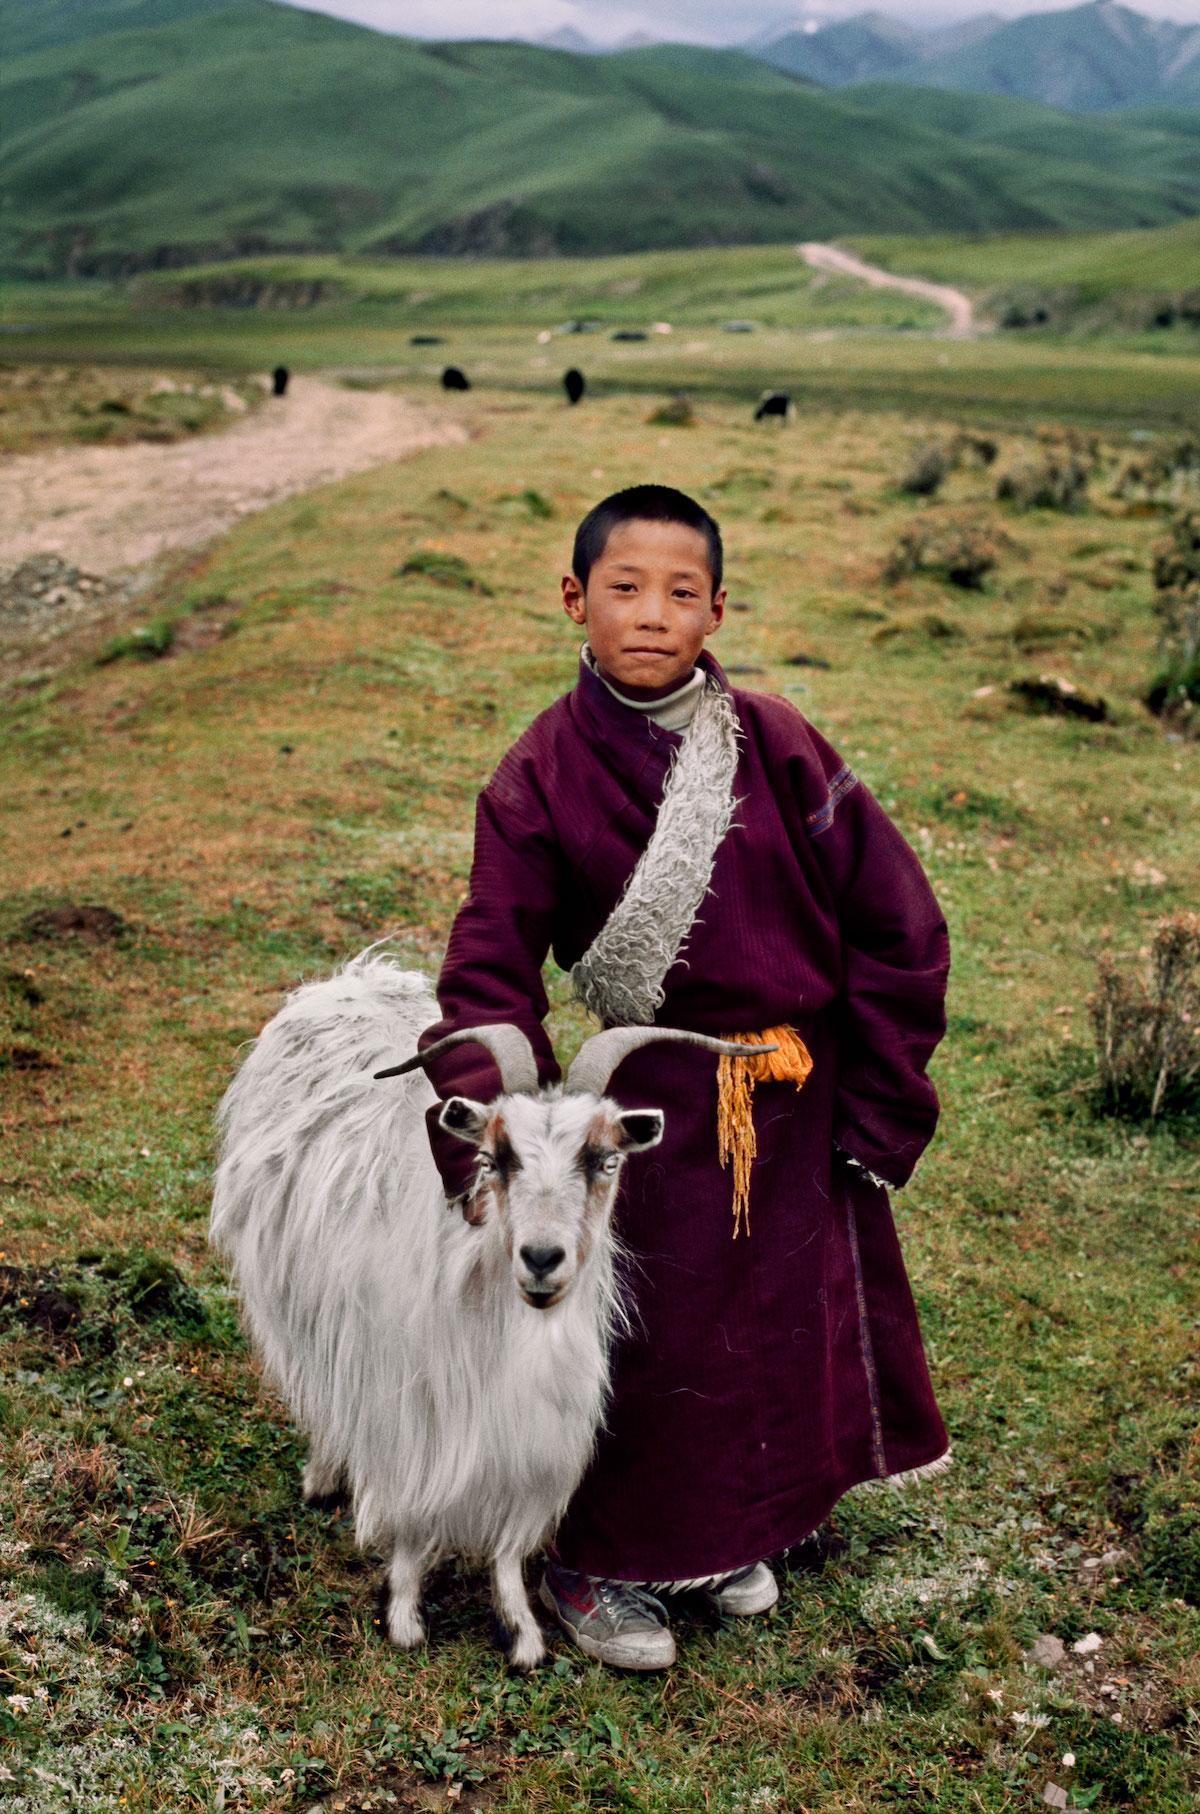 libro de fotografia Steve McCurry